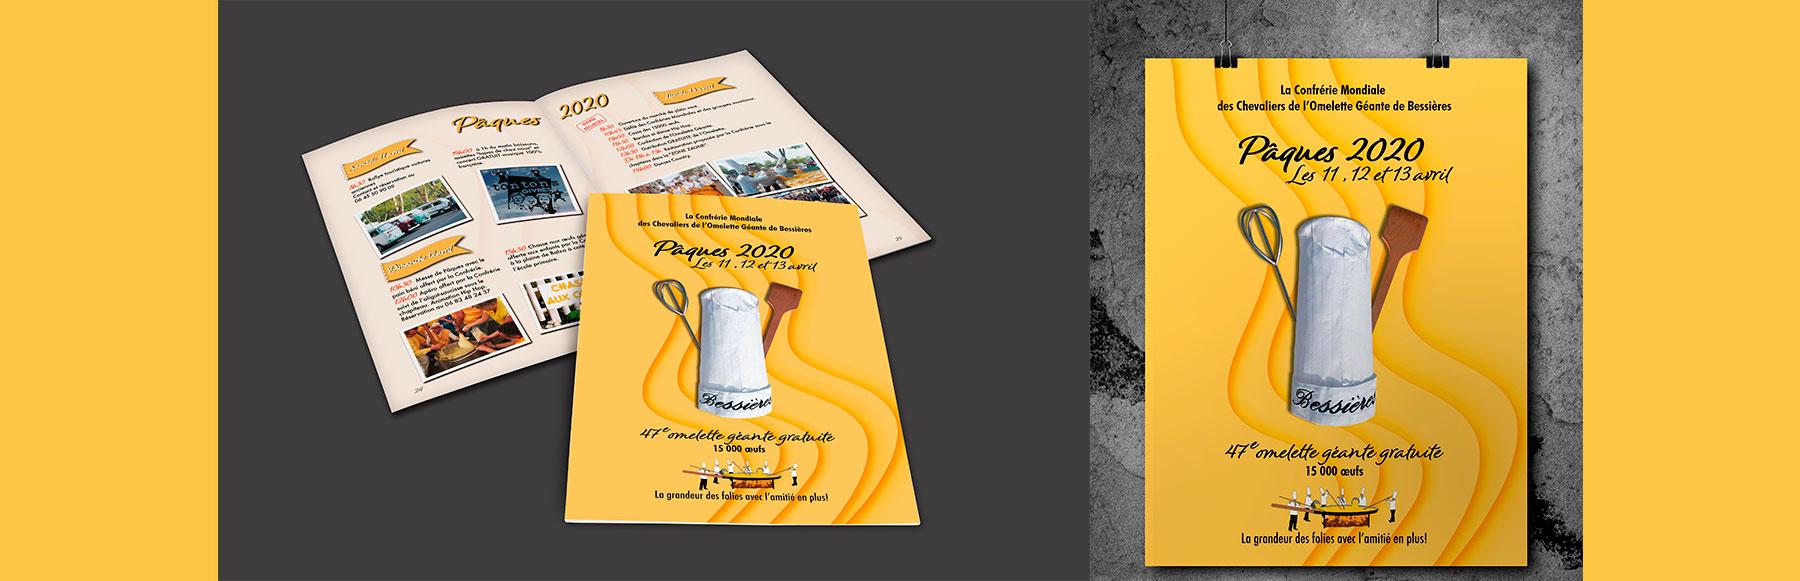 Brochure Omelette Géante 2020